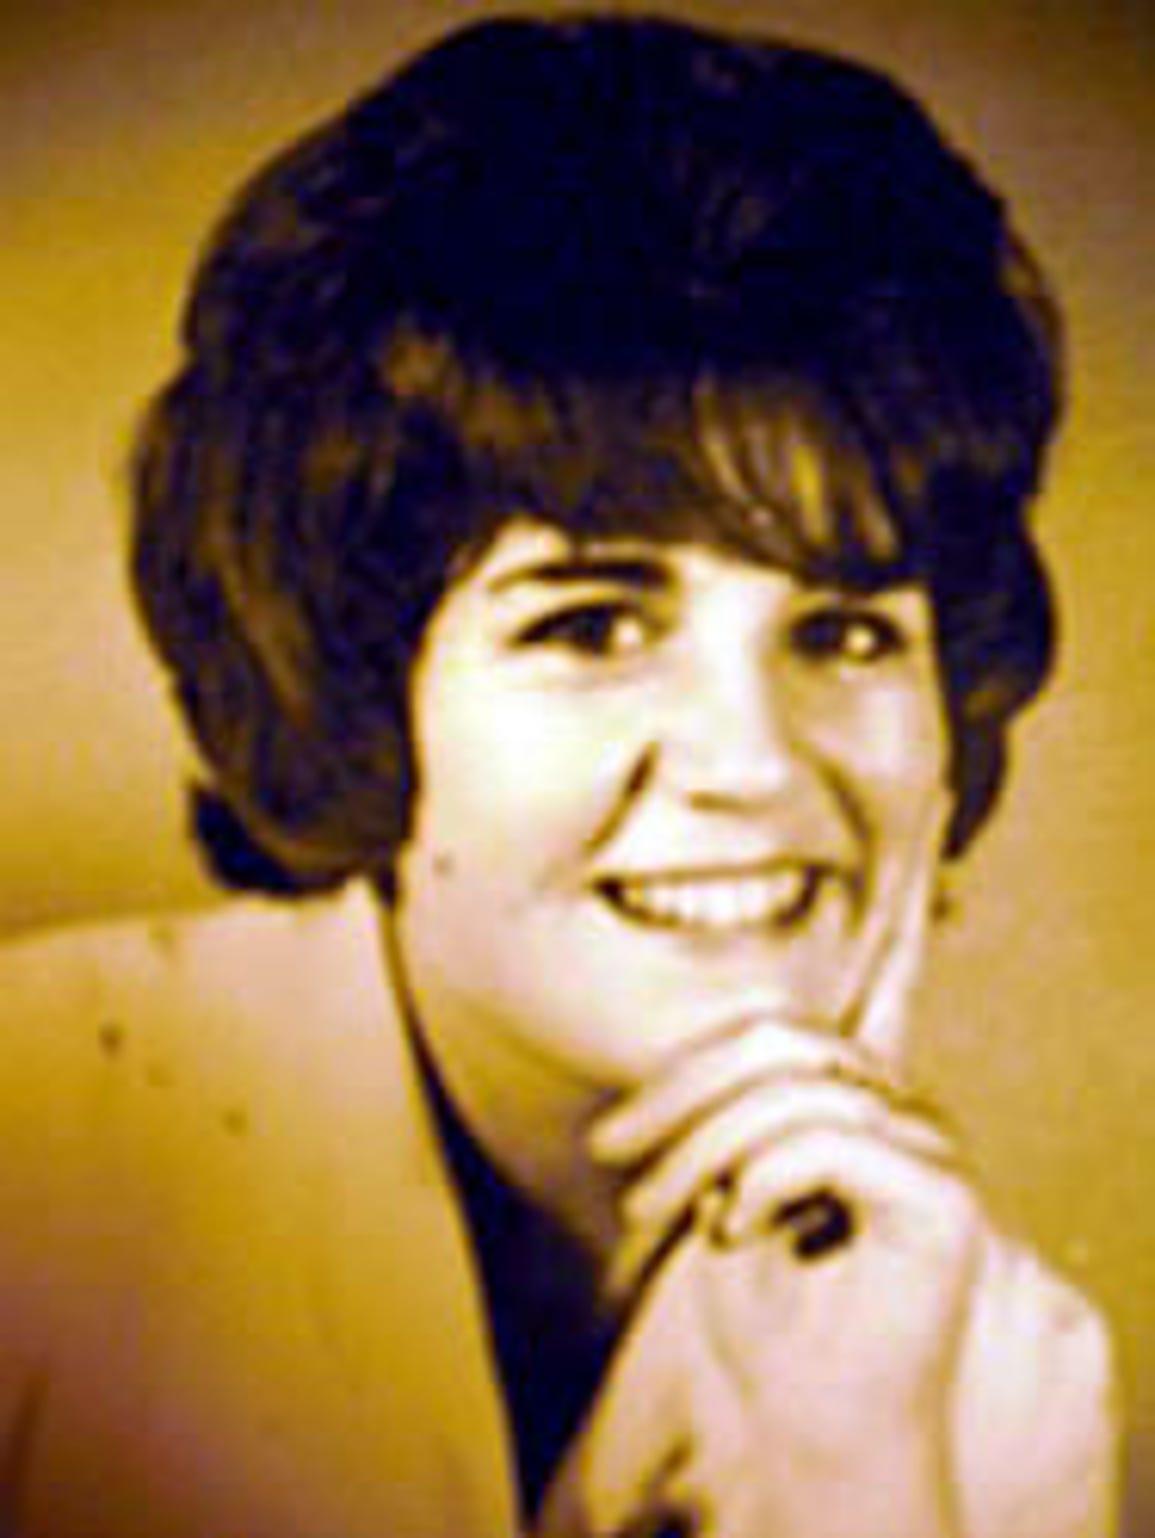 Mary Costa, 1972 murder victim